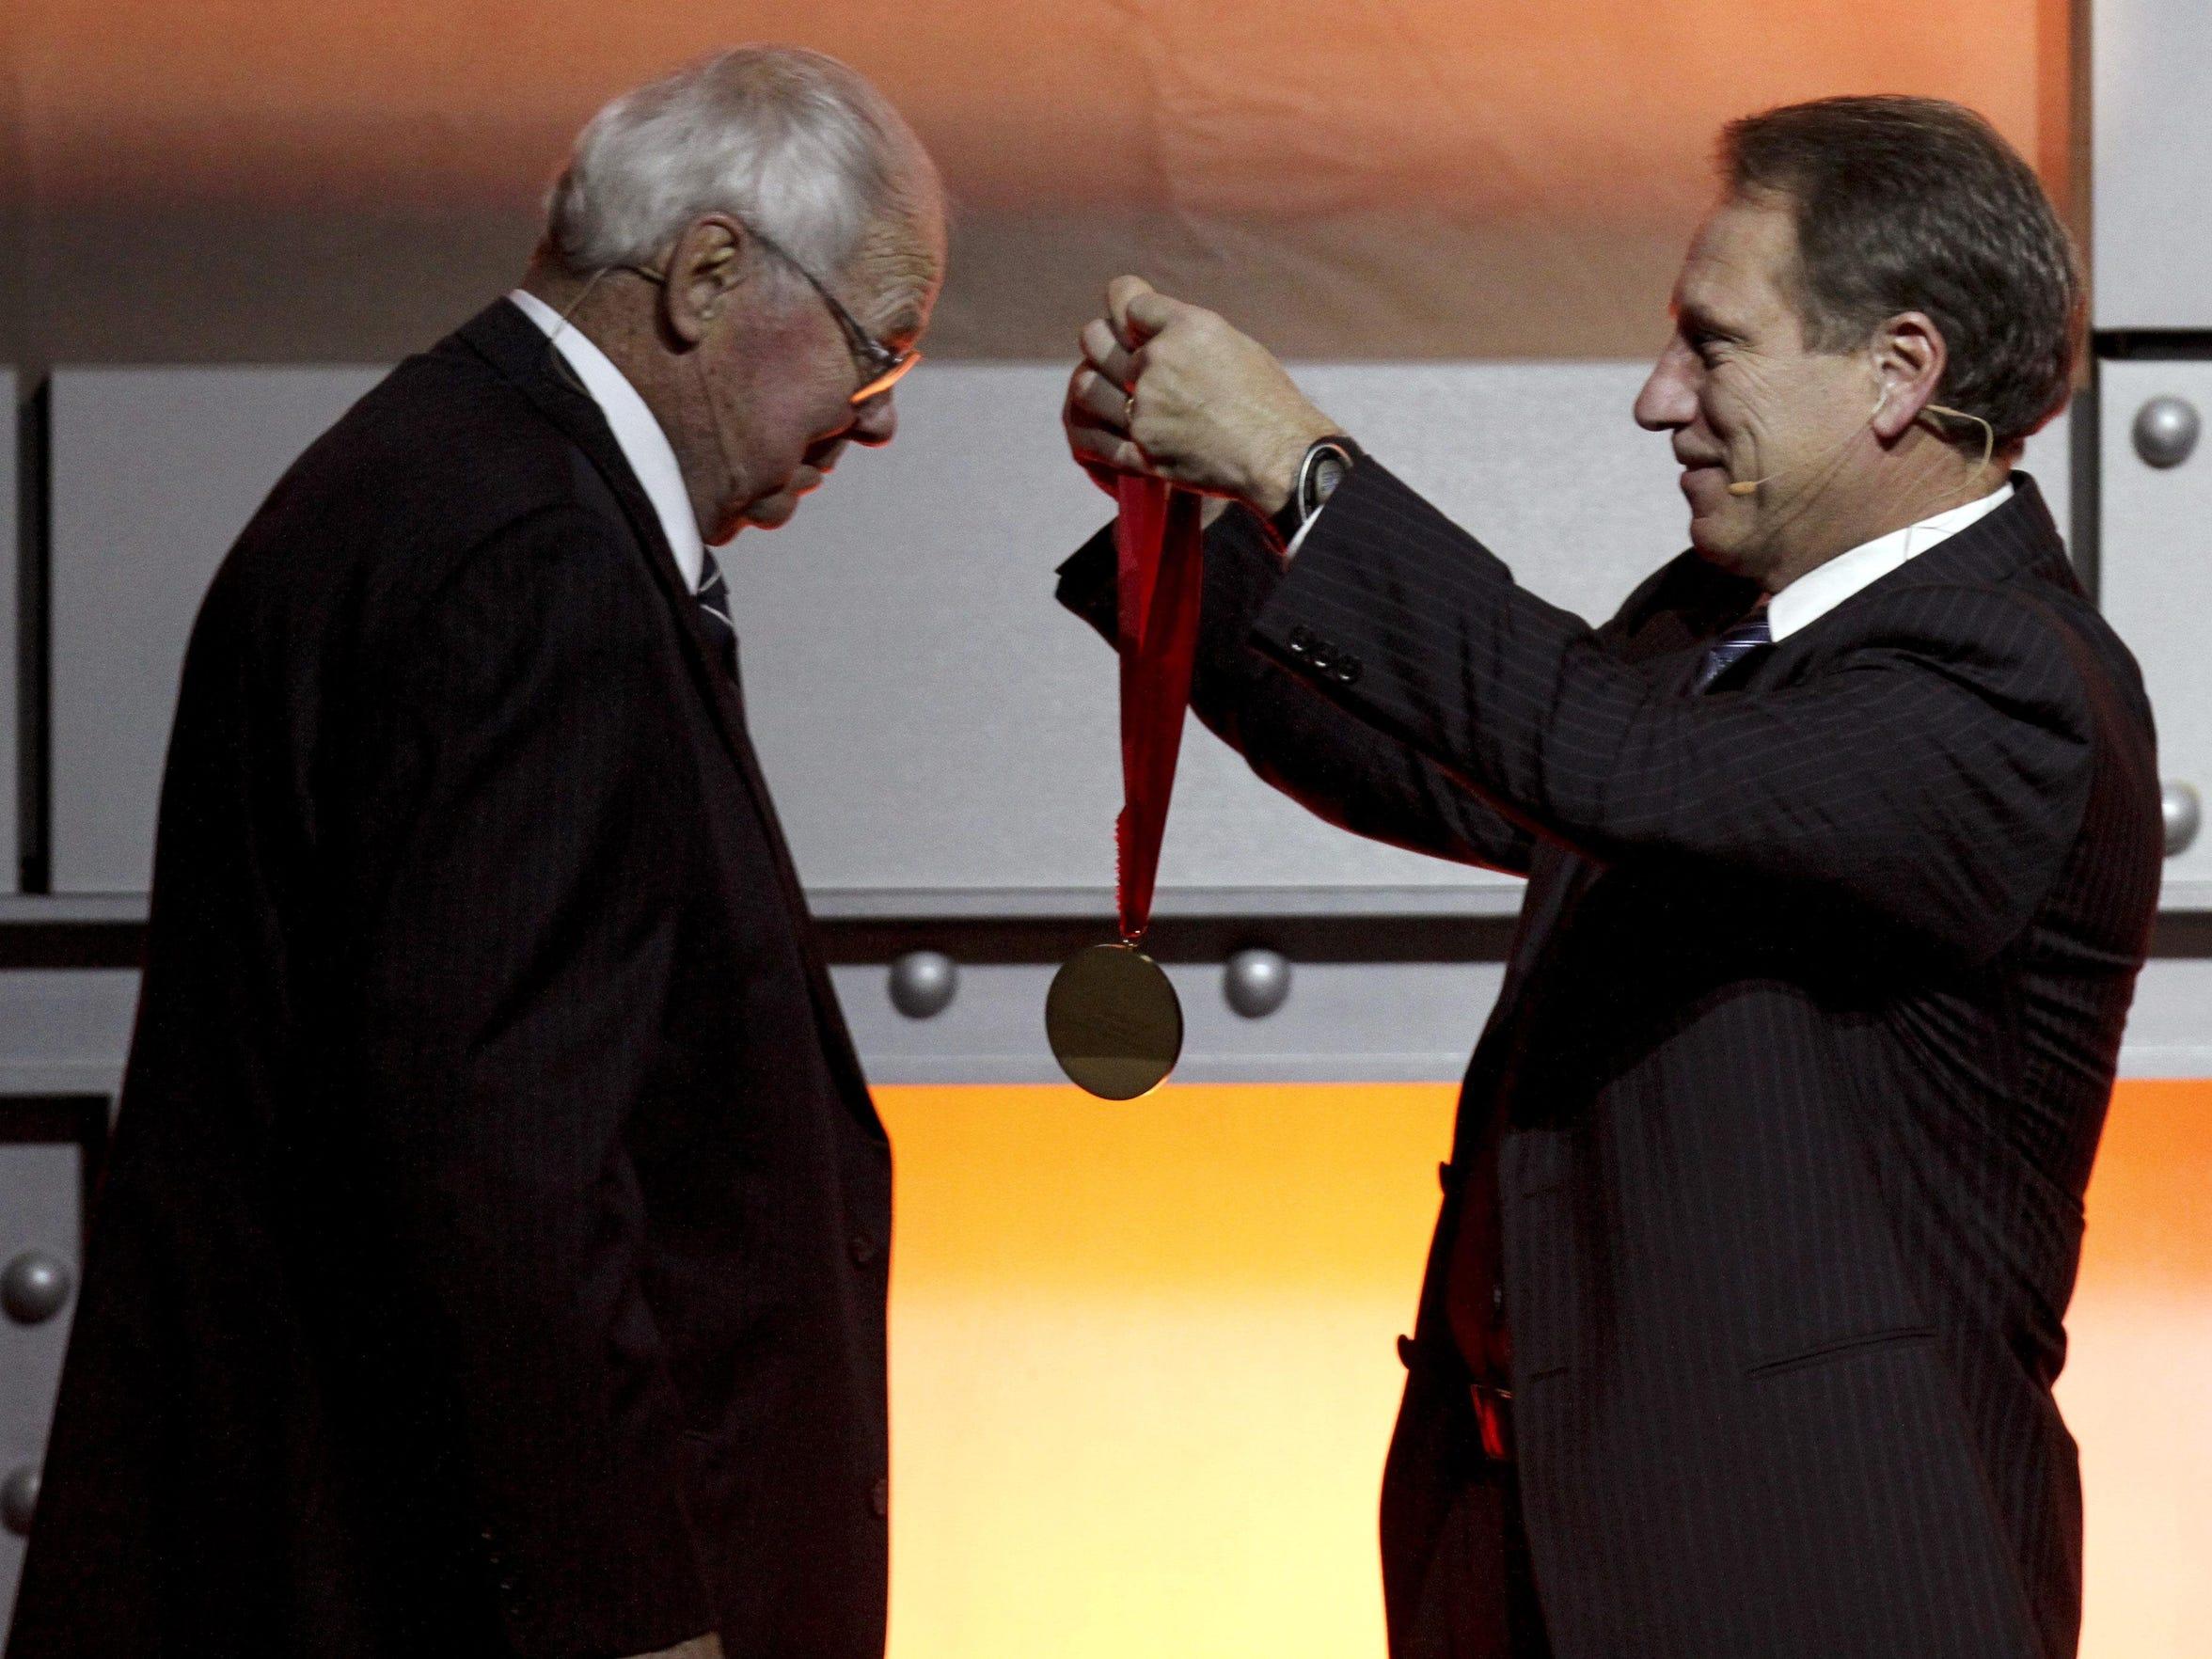 Former Michigan State basketball coach Jud Heathcote,